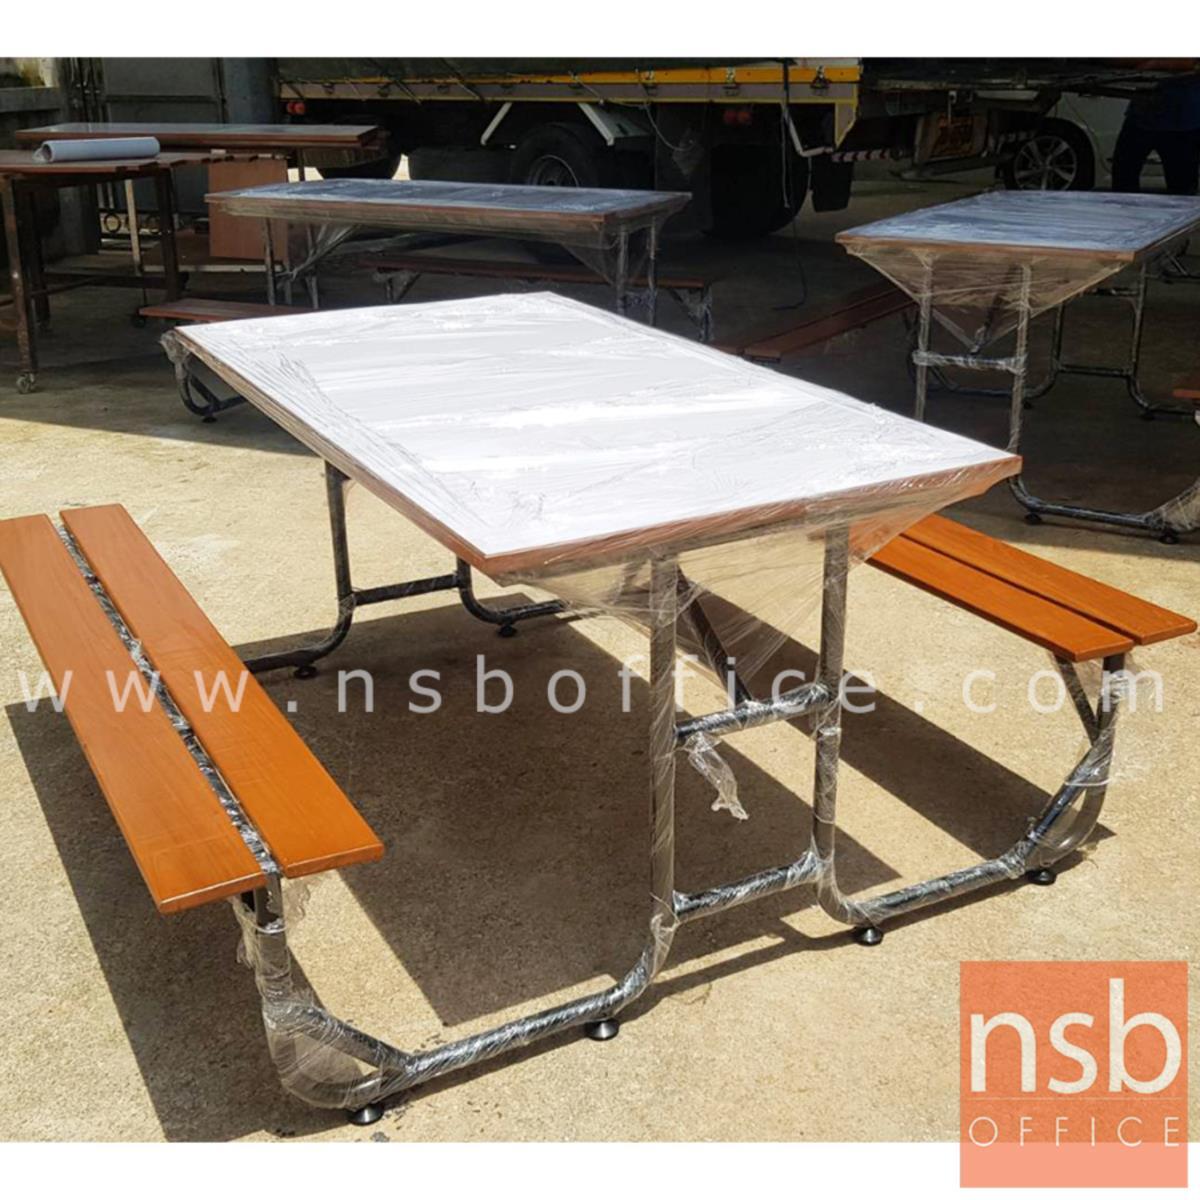 A17A093:ชุดโต๊ะและเก้าอี้ไม้กิจกรรม รุ่น gardenia (การ์ดิเนีย) ขนาด 150W, 180W cm.